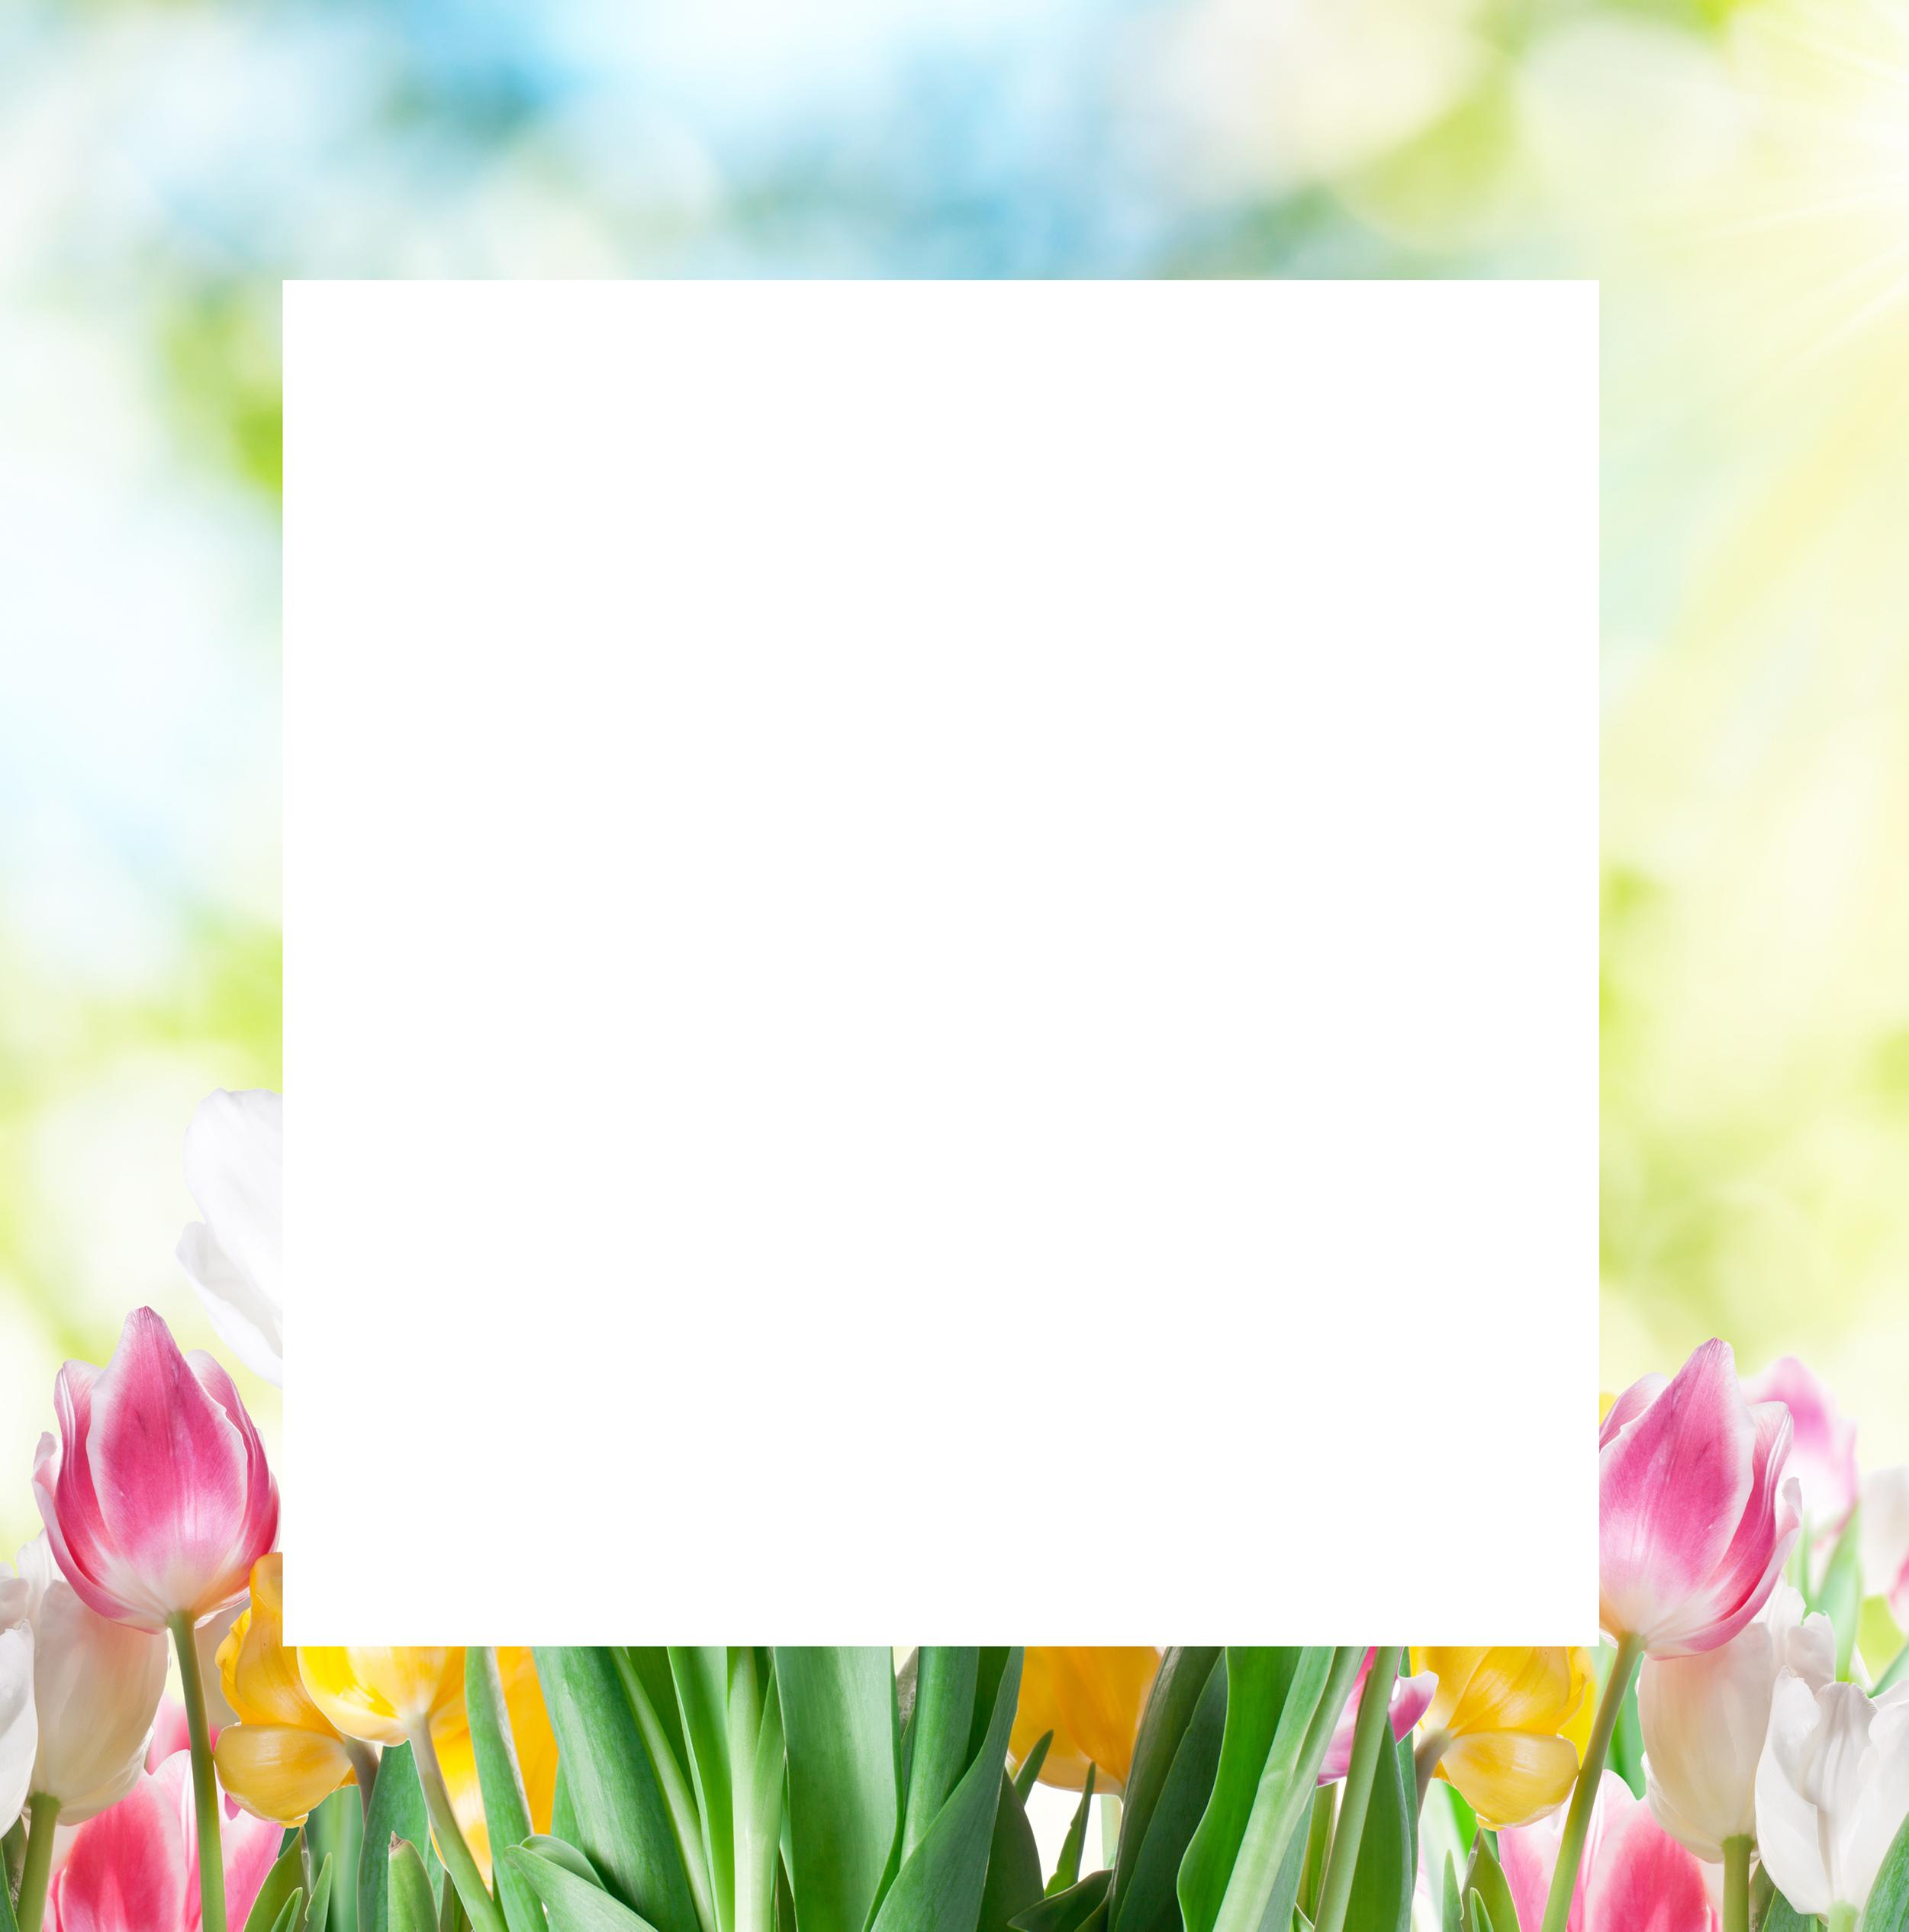 Decoframefolie Frühjahr